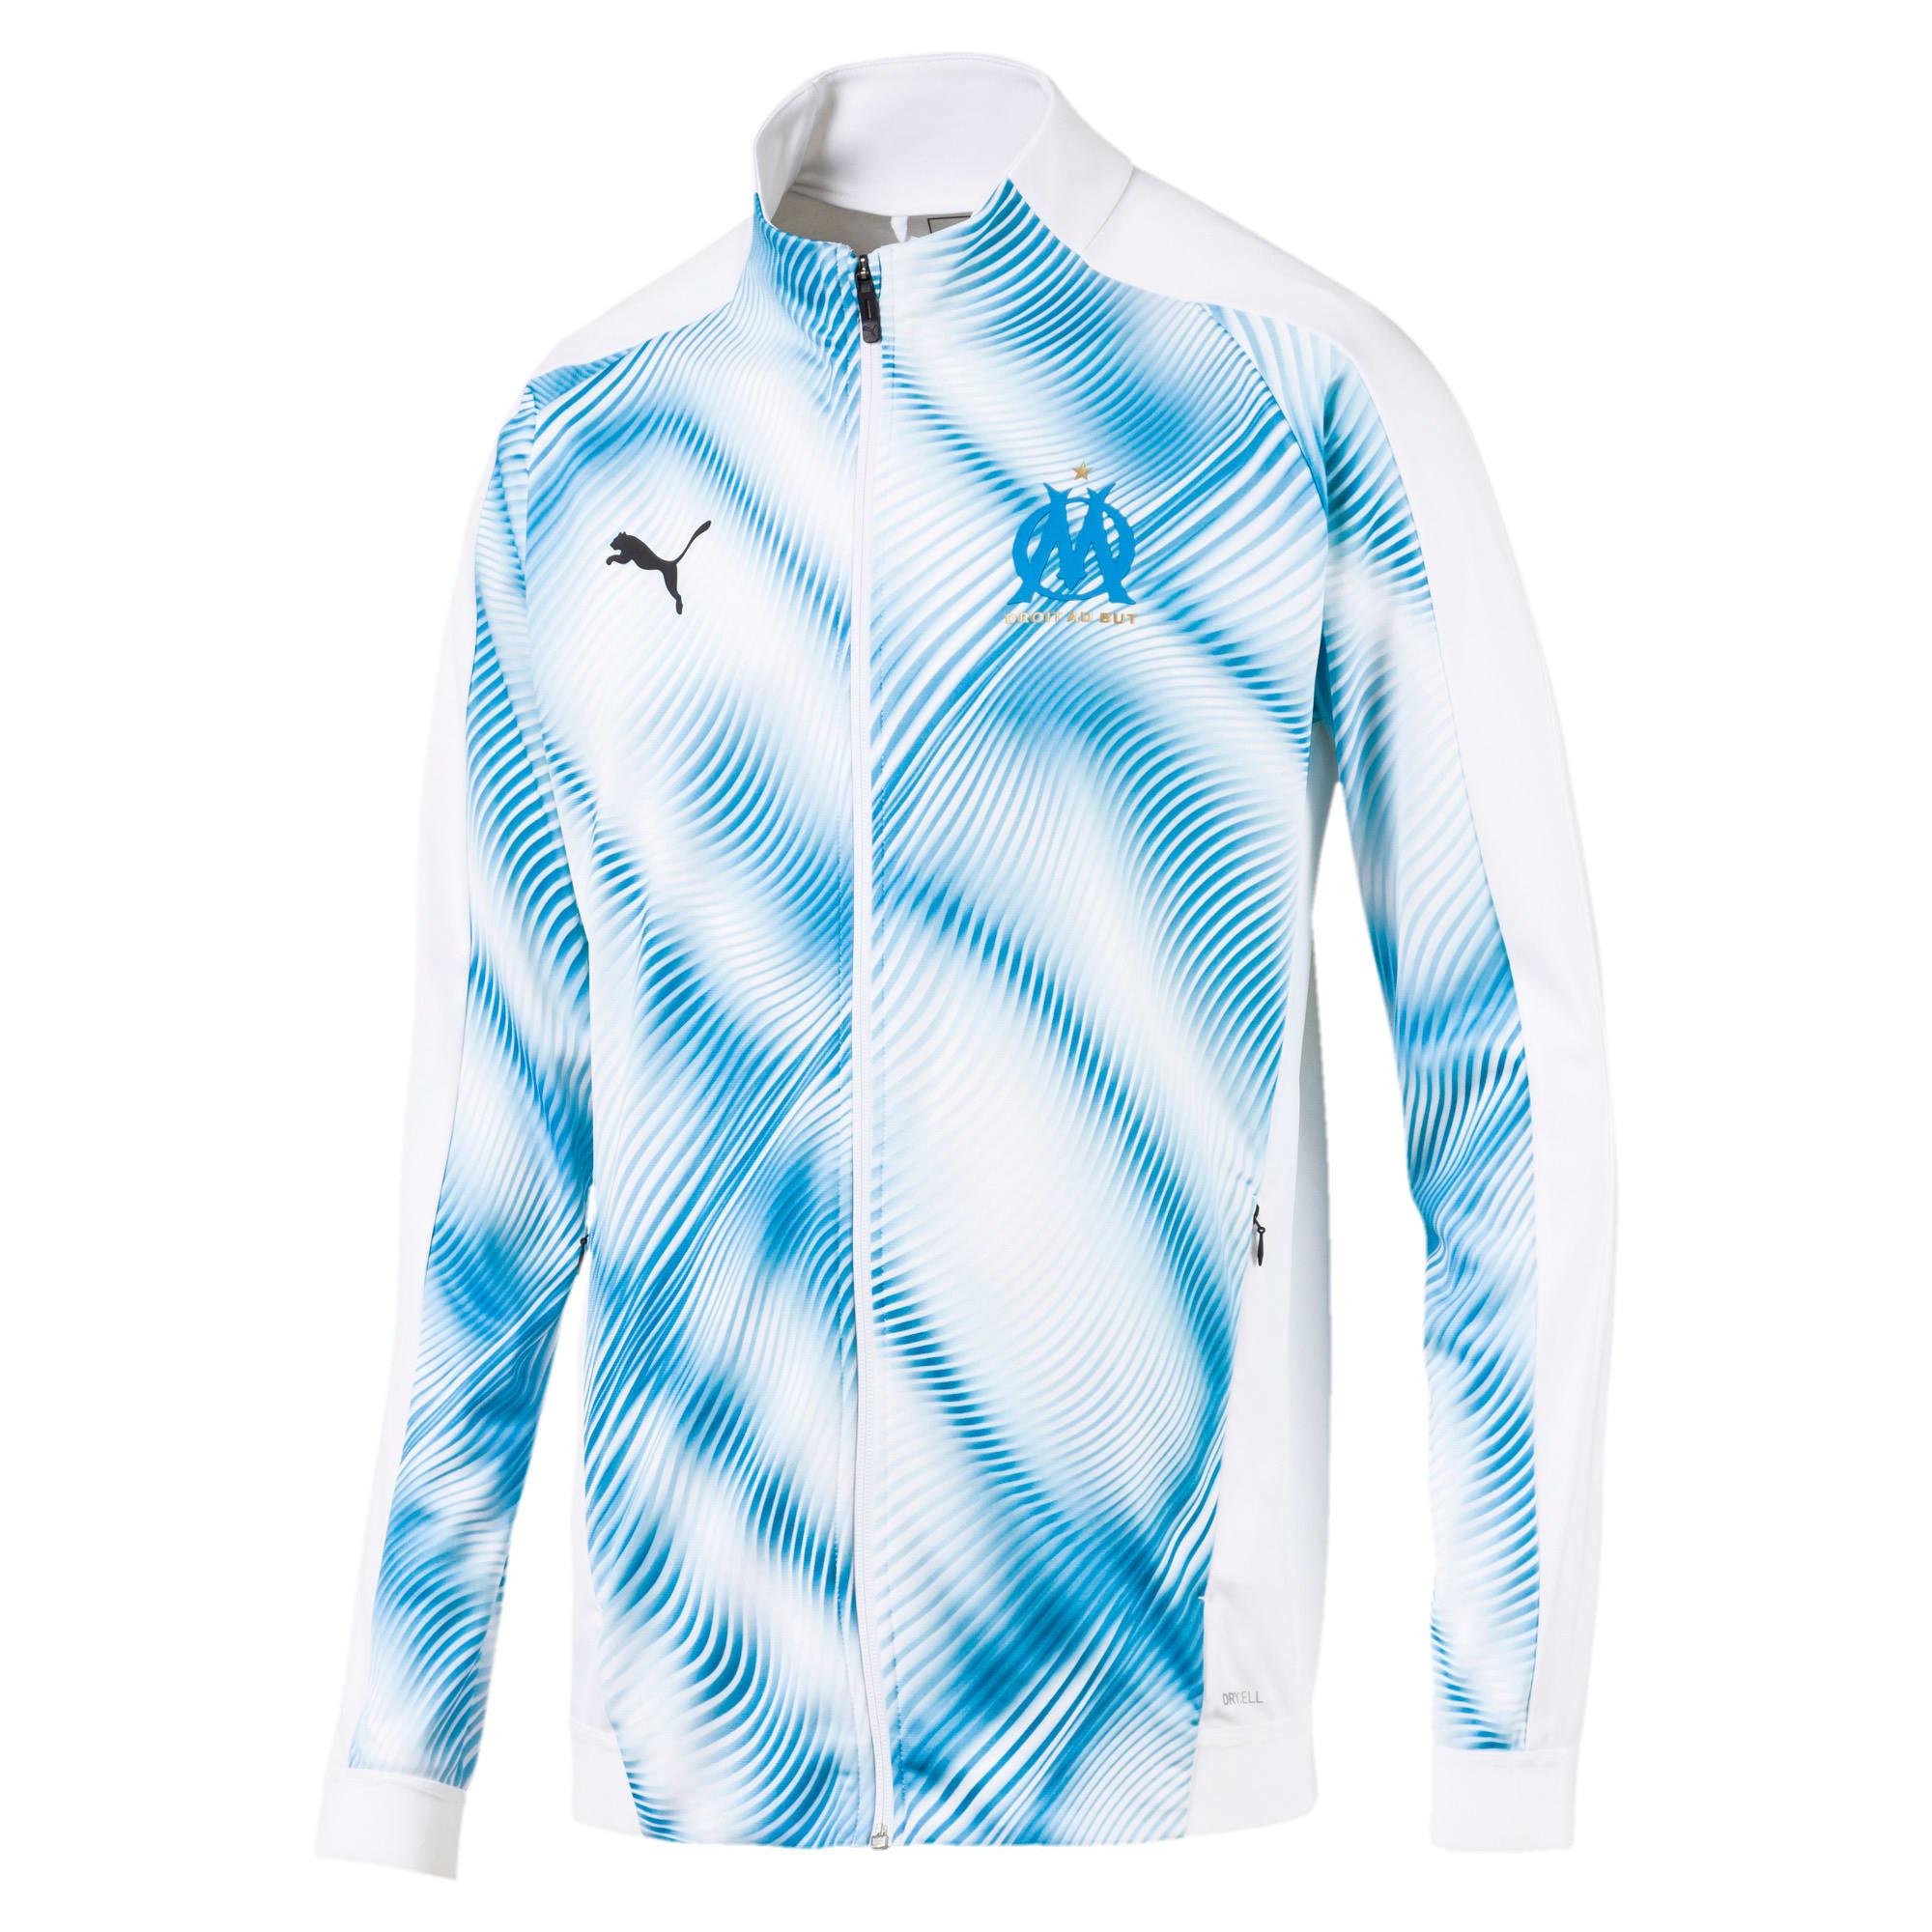 Thumbnail 1 of Olympique de Marseille Stadium Men's Jacket, Puma White-Bleu Azur, medium